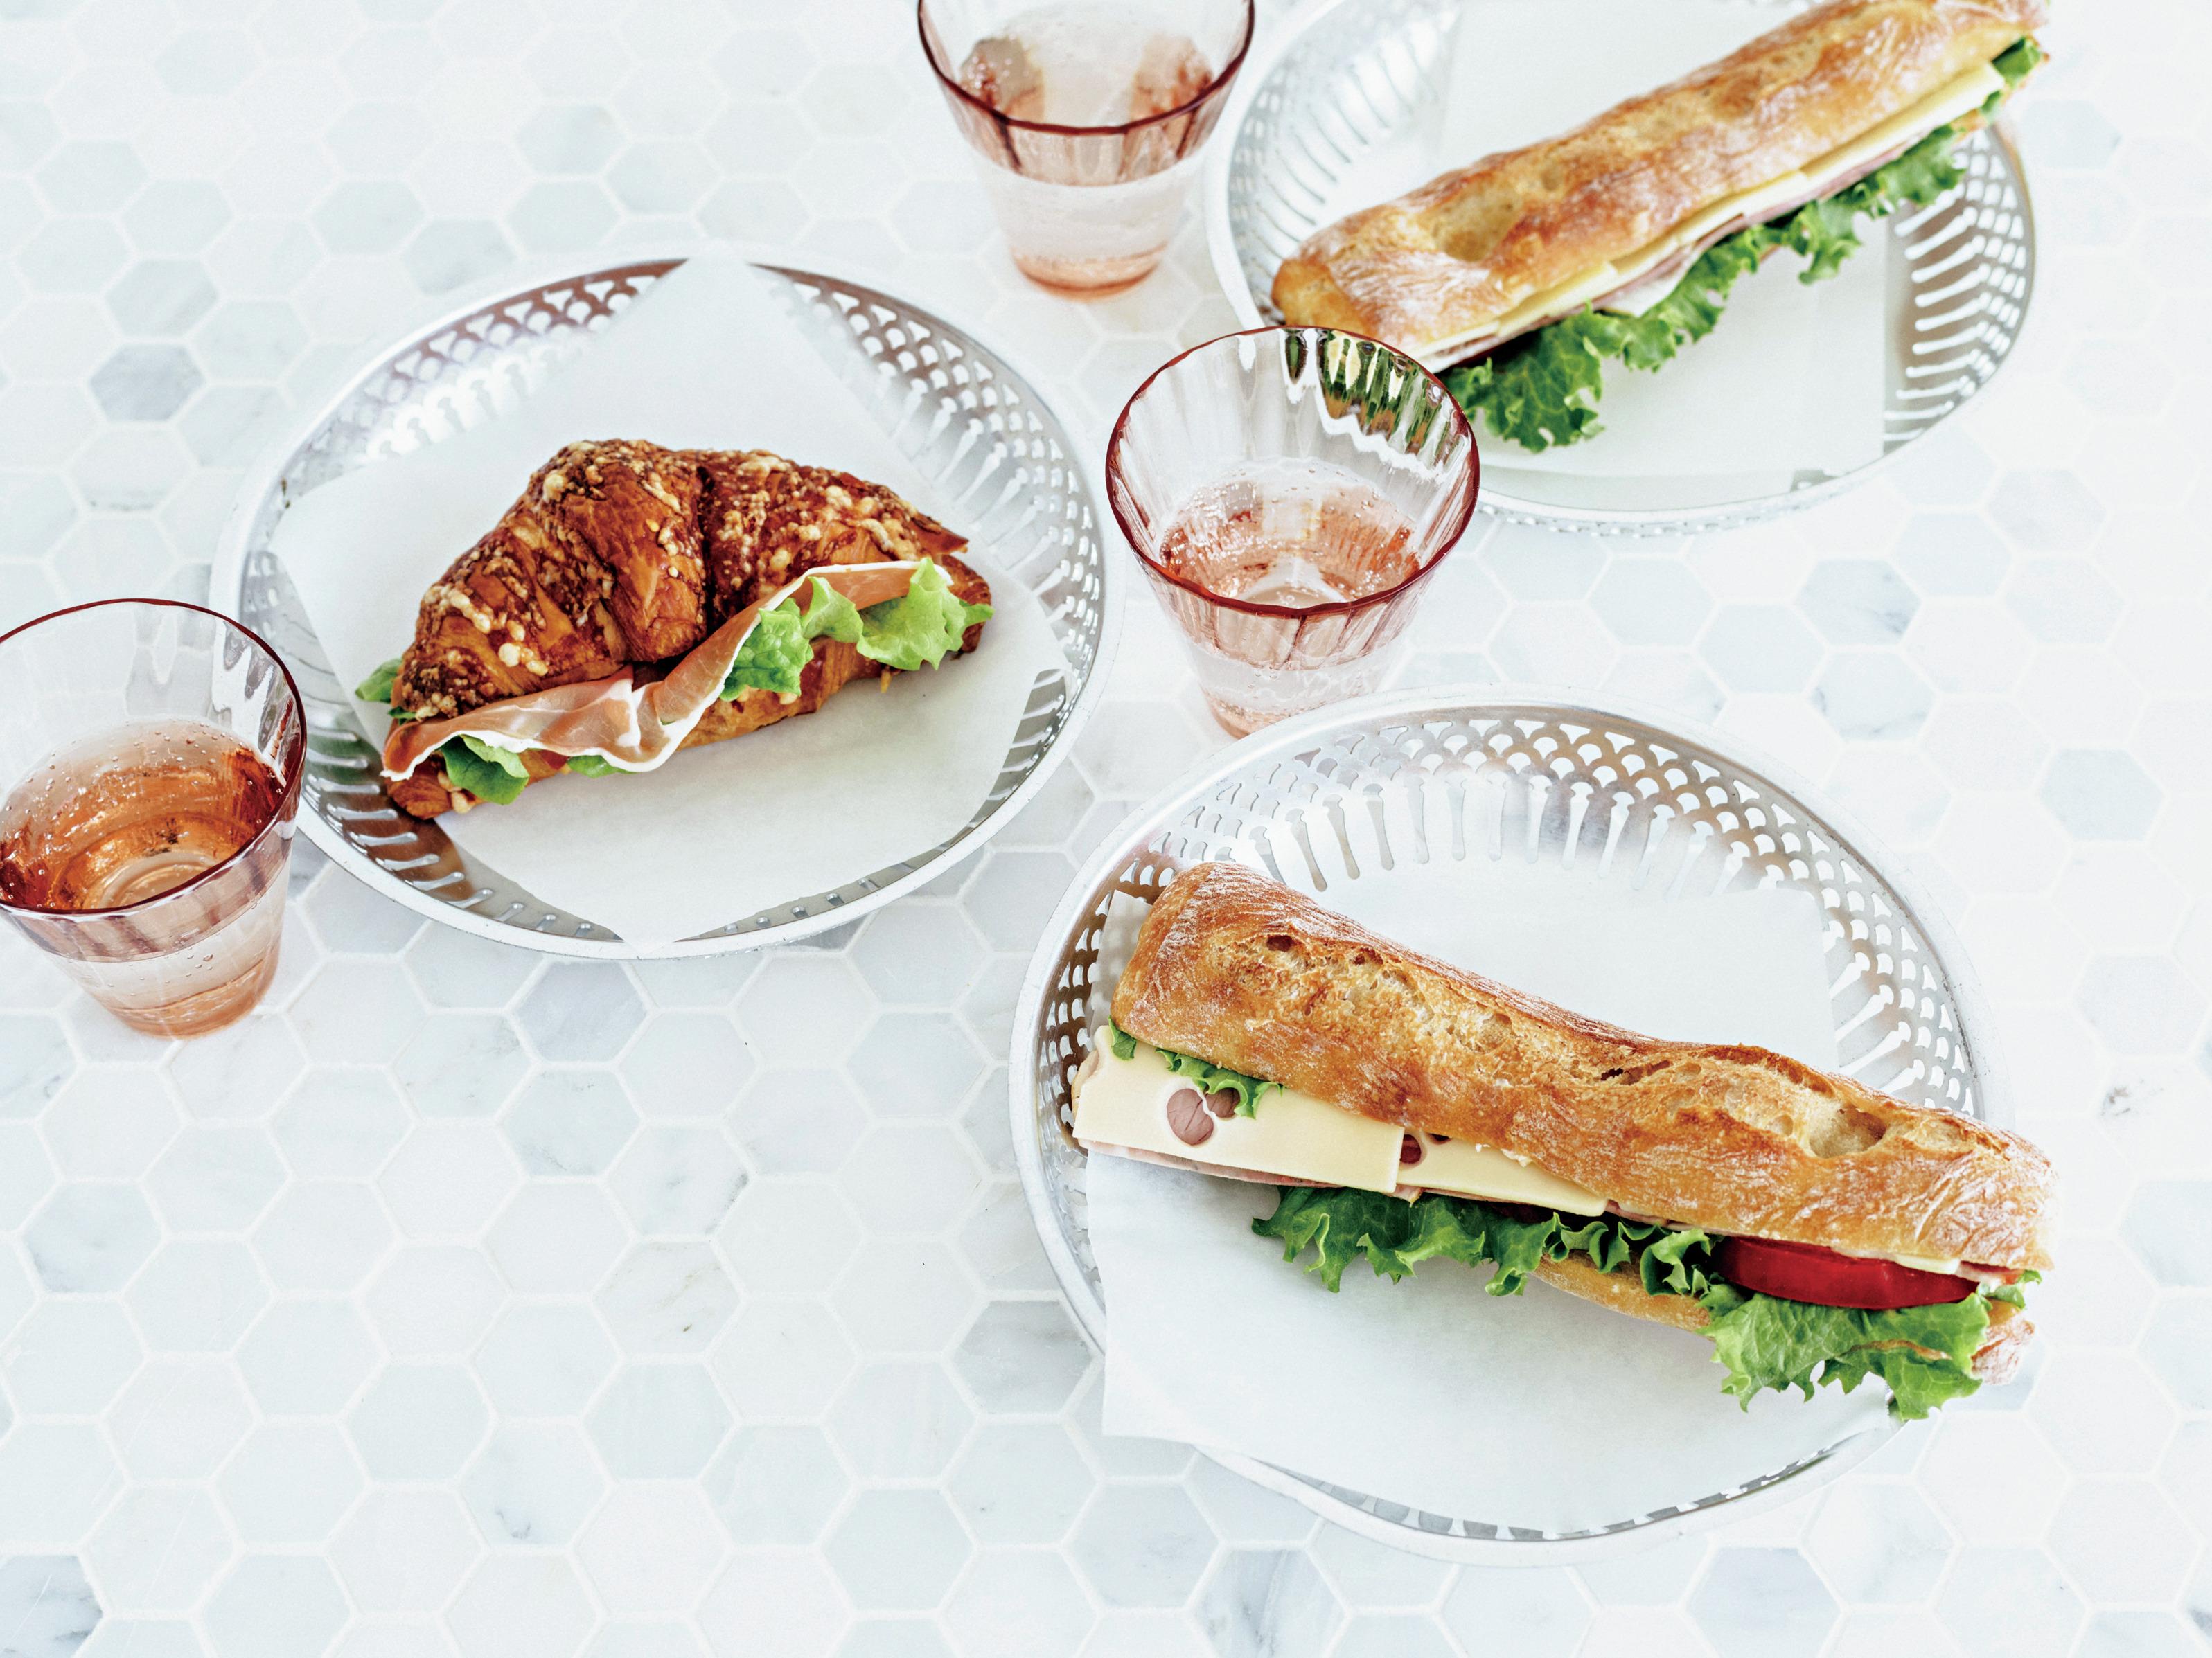 『PAUL』は今年で創業130周年! スイーツにサンドイッチに、本場フランスの味をご堪能あれ♥_3